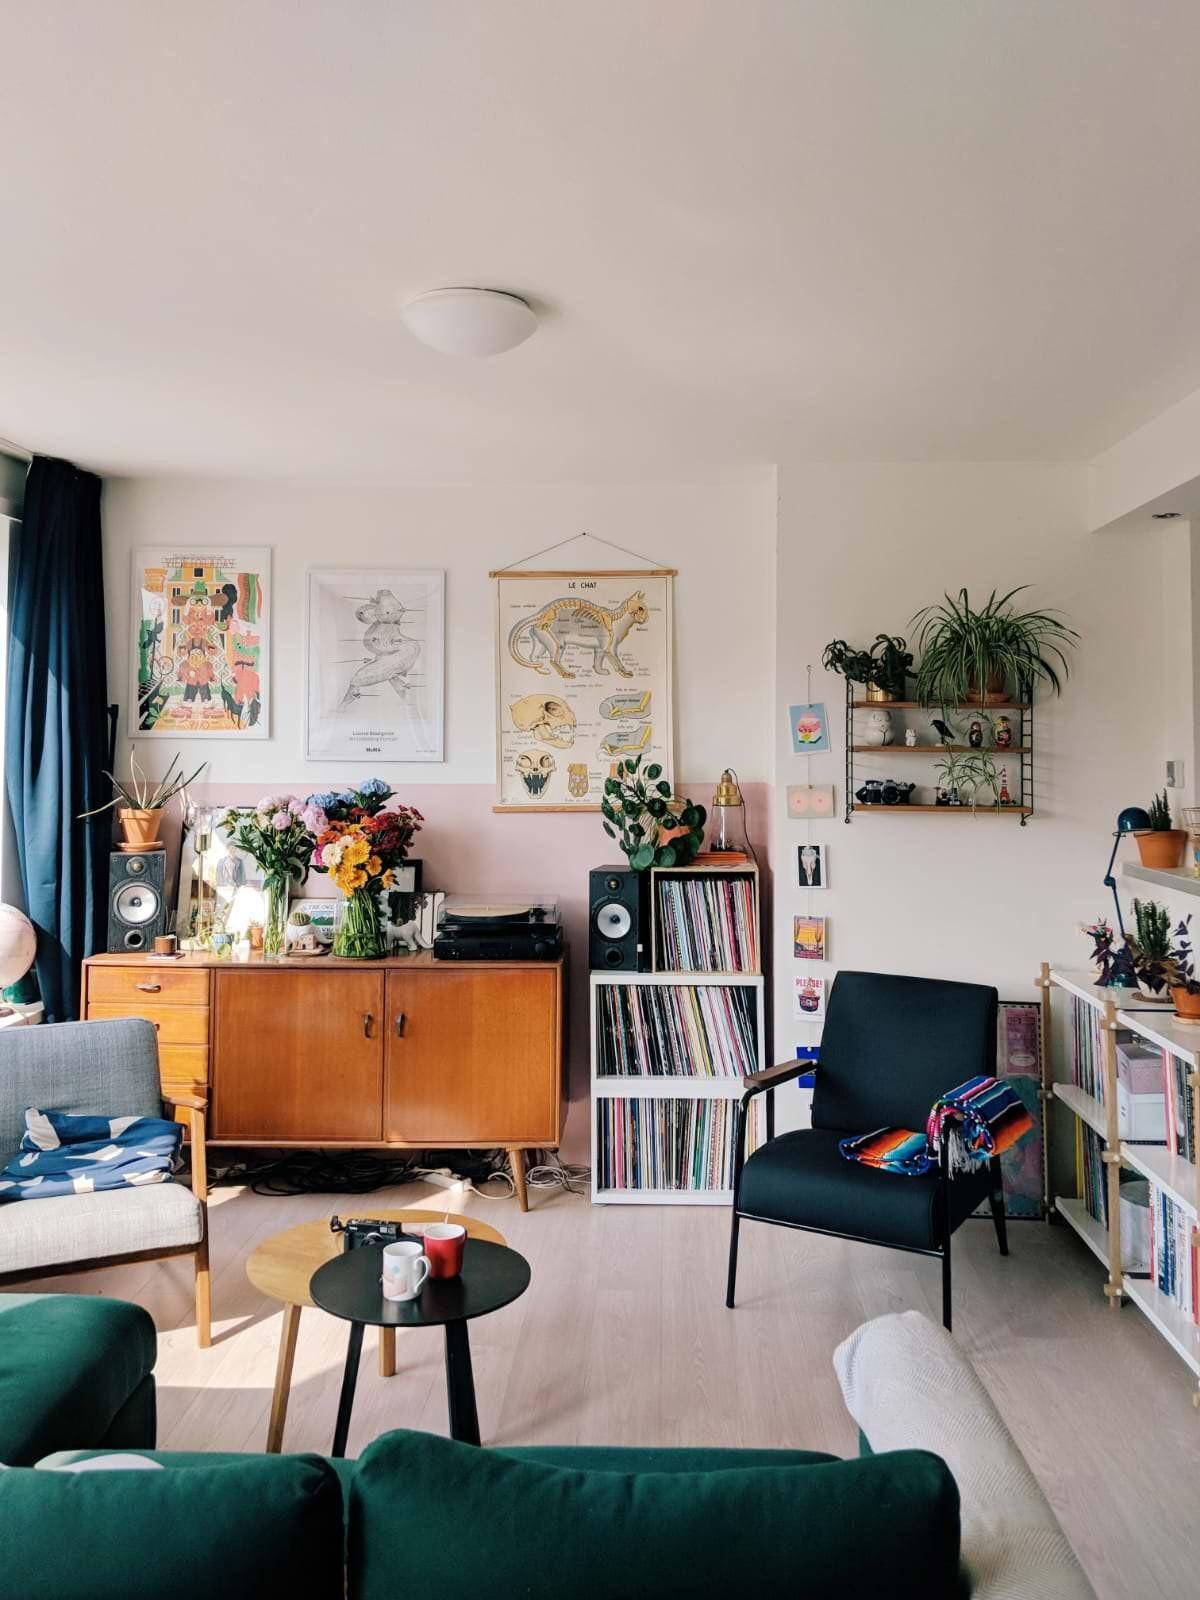 Dream House White Walls Wood Living Room Bedroom Bed Books Shelf Shelving Open Bright Coz Living Room Decor Apartment Small Living Room Decor Living Room Inspo #orange #and #white #living #room